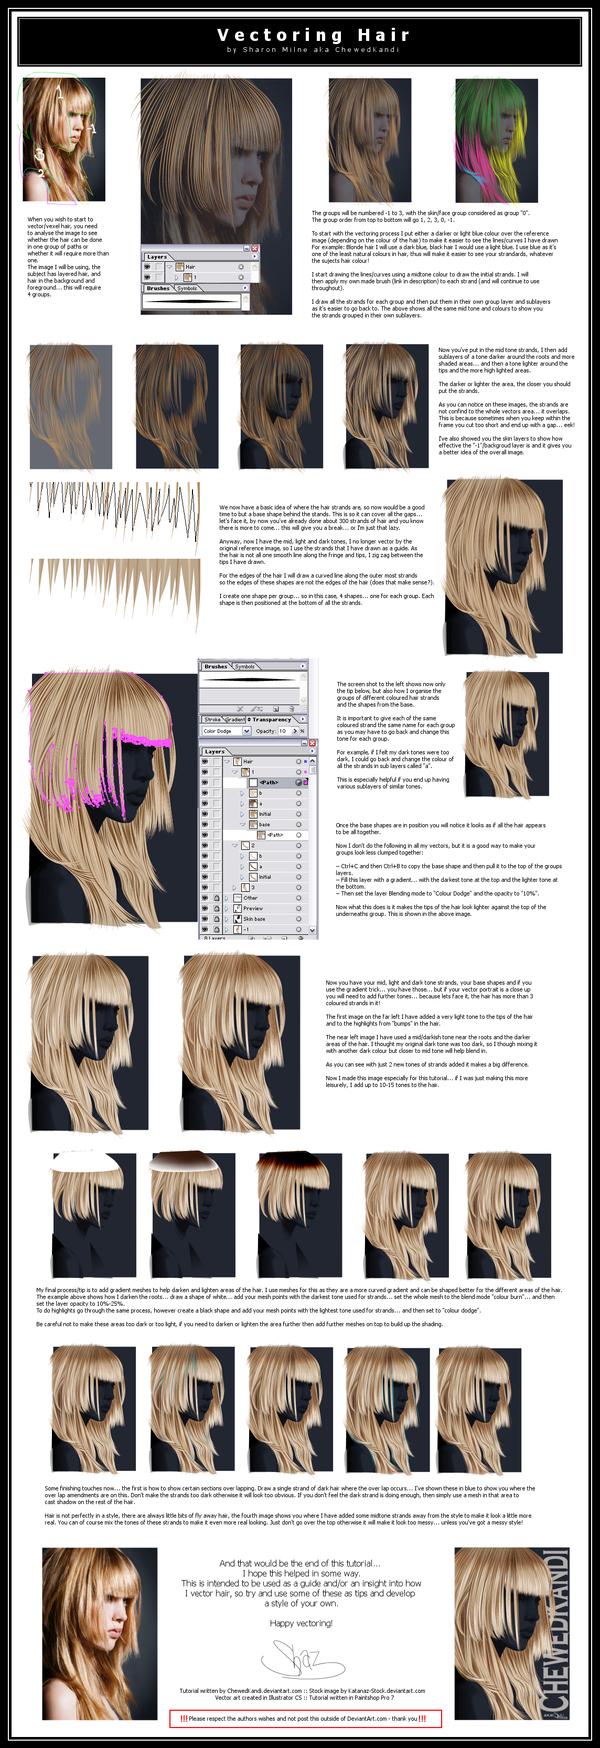 Vectoring Hair by ChewedKandi on deviantART